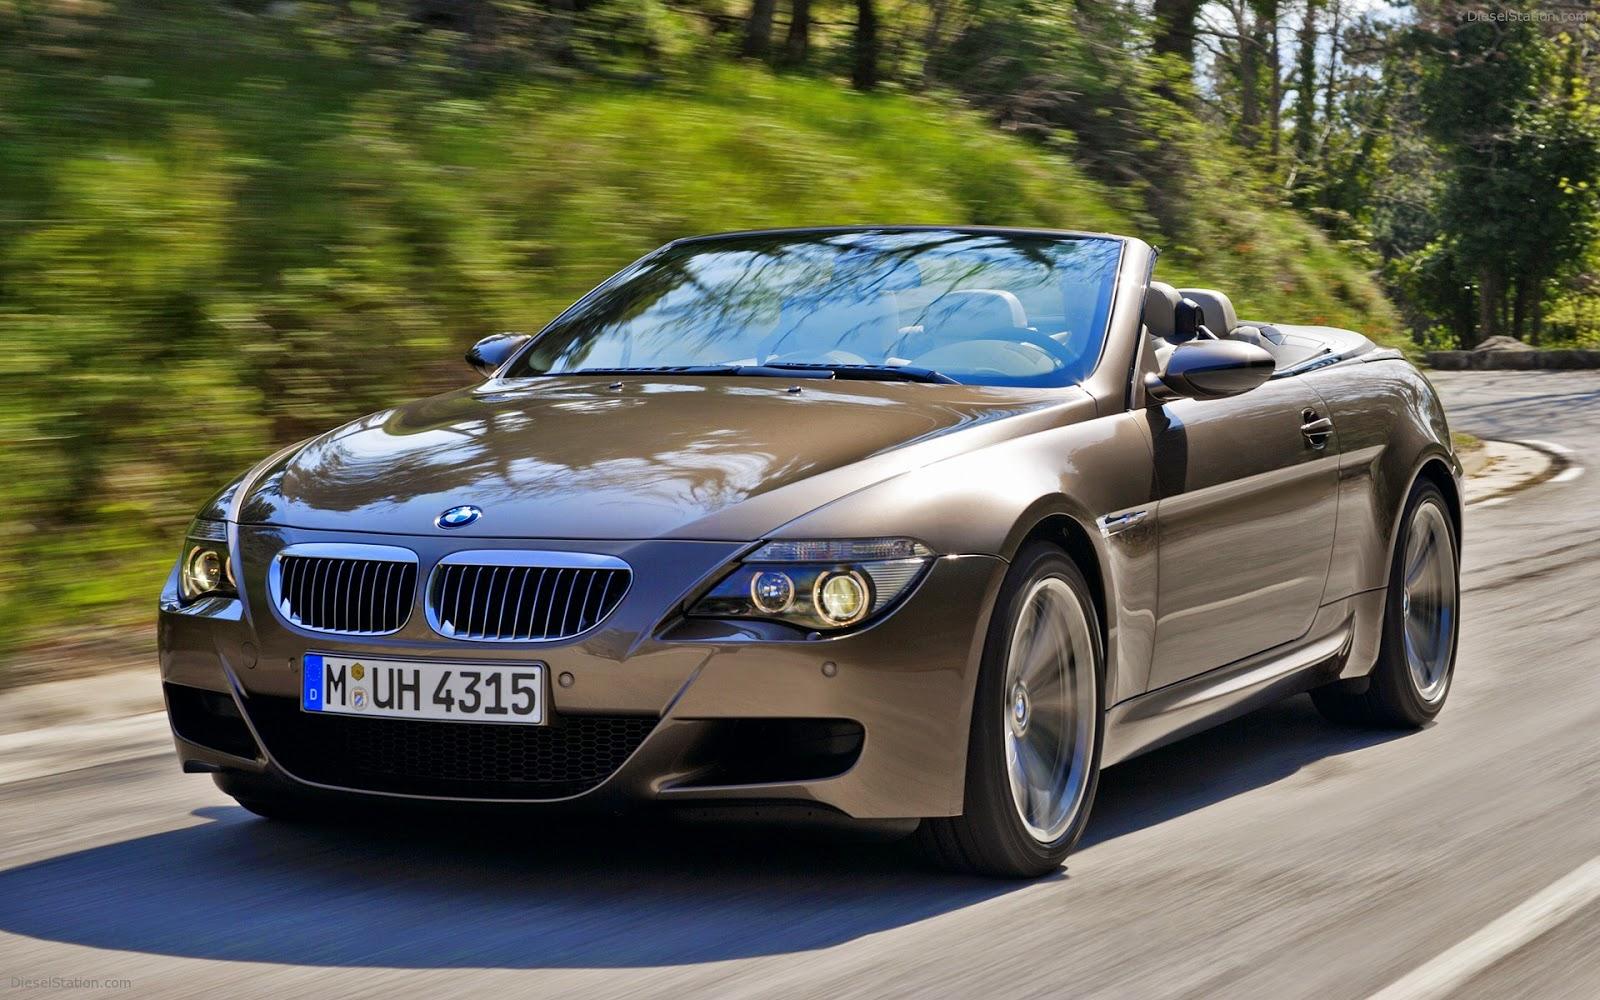 photos: BMW M6